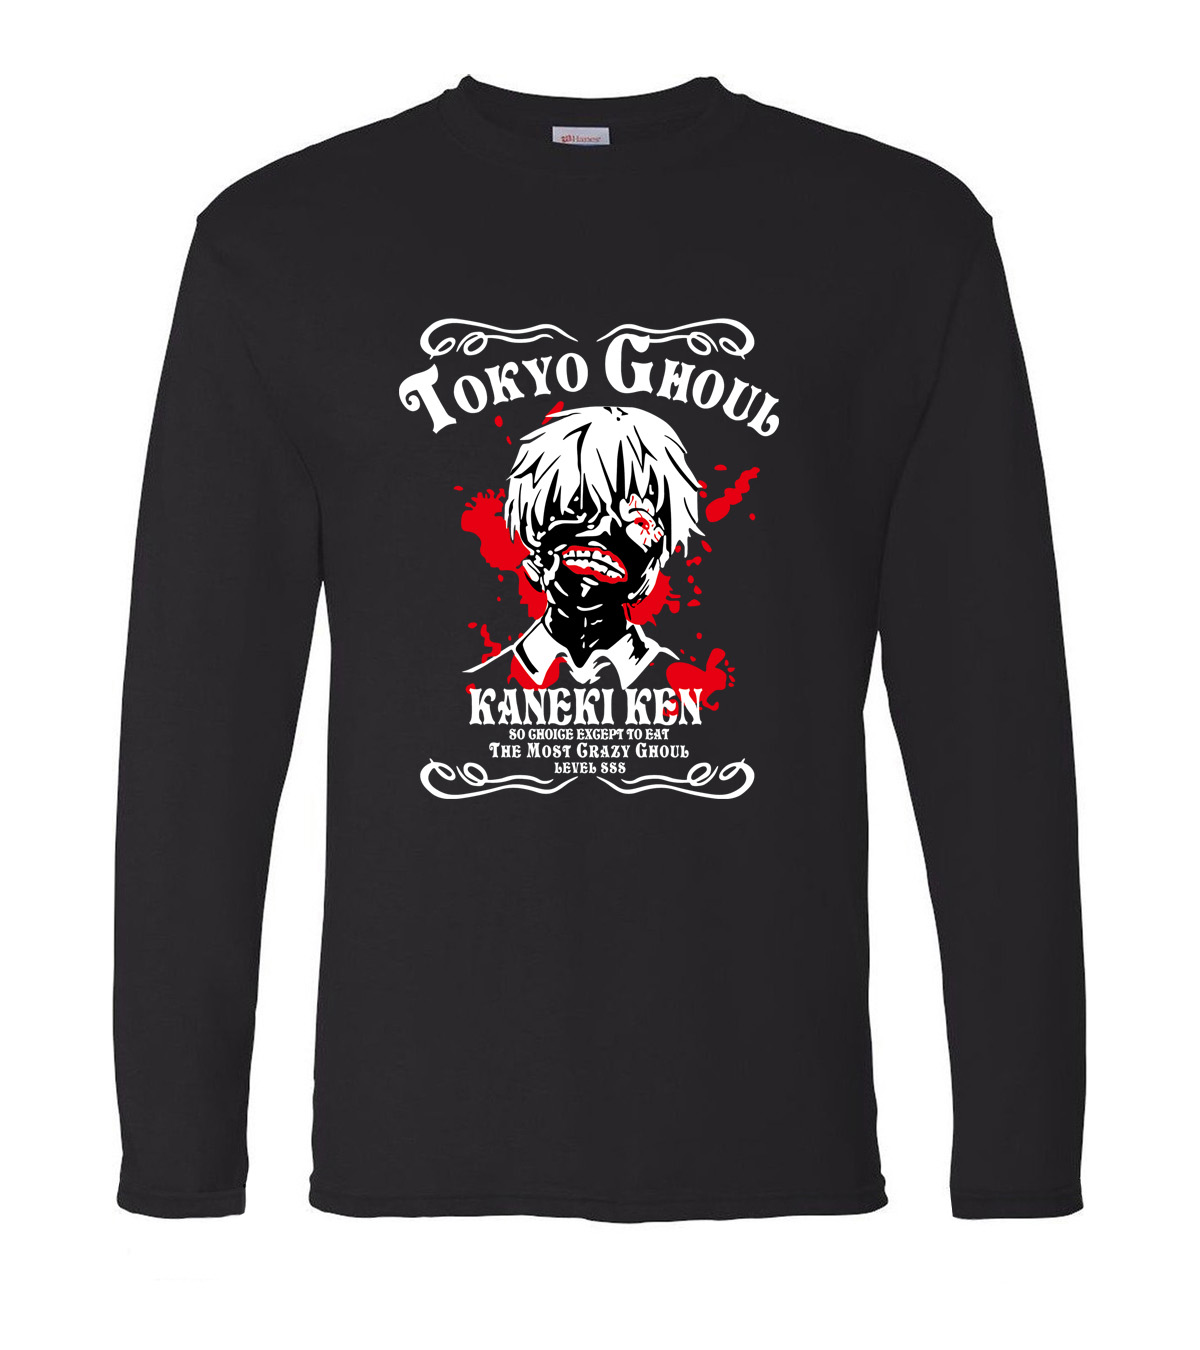 Anime Tokyo Ghoul Ken Kaneki Men t shirt 2019 new spring 100% cotton men's long sleeve o-neck T-shirts hip hop man top tees